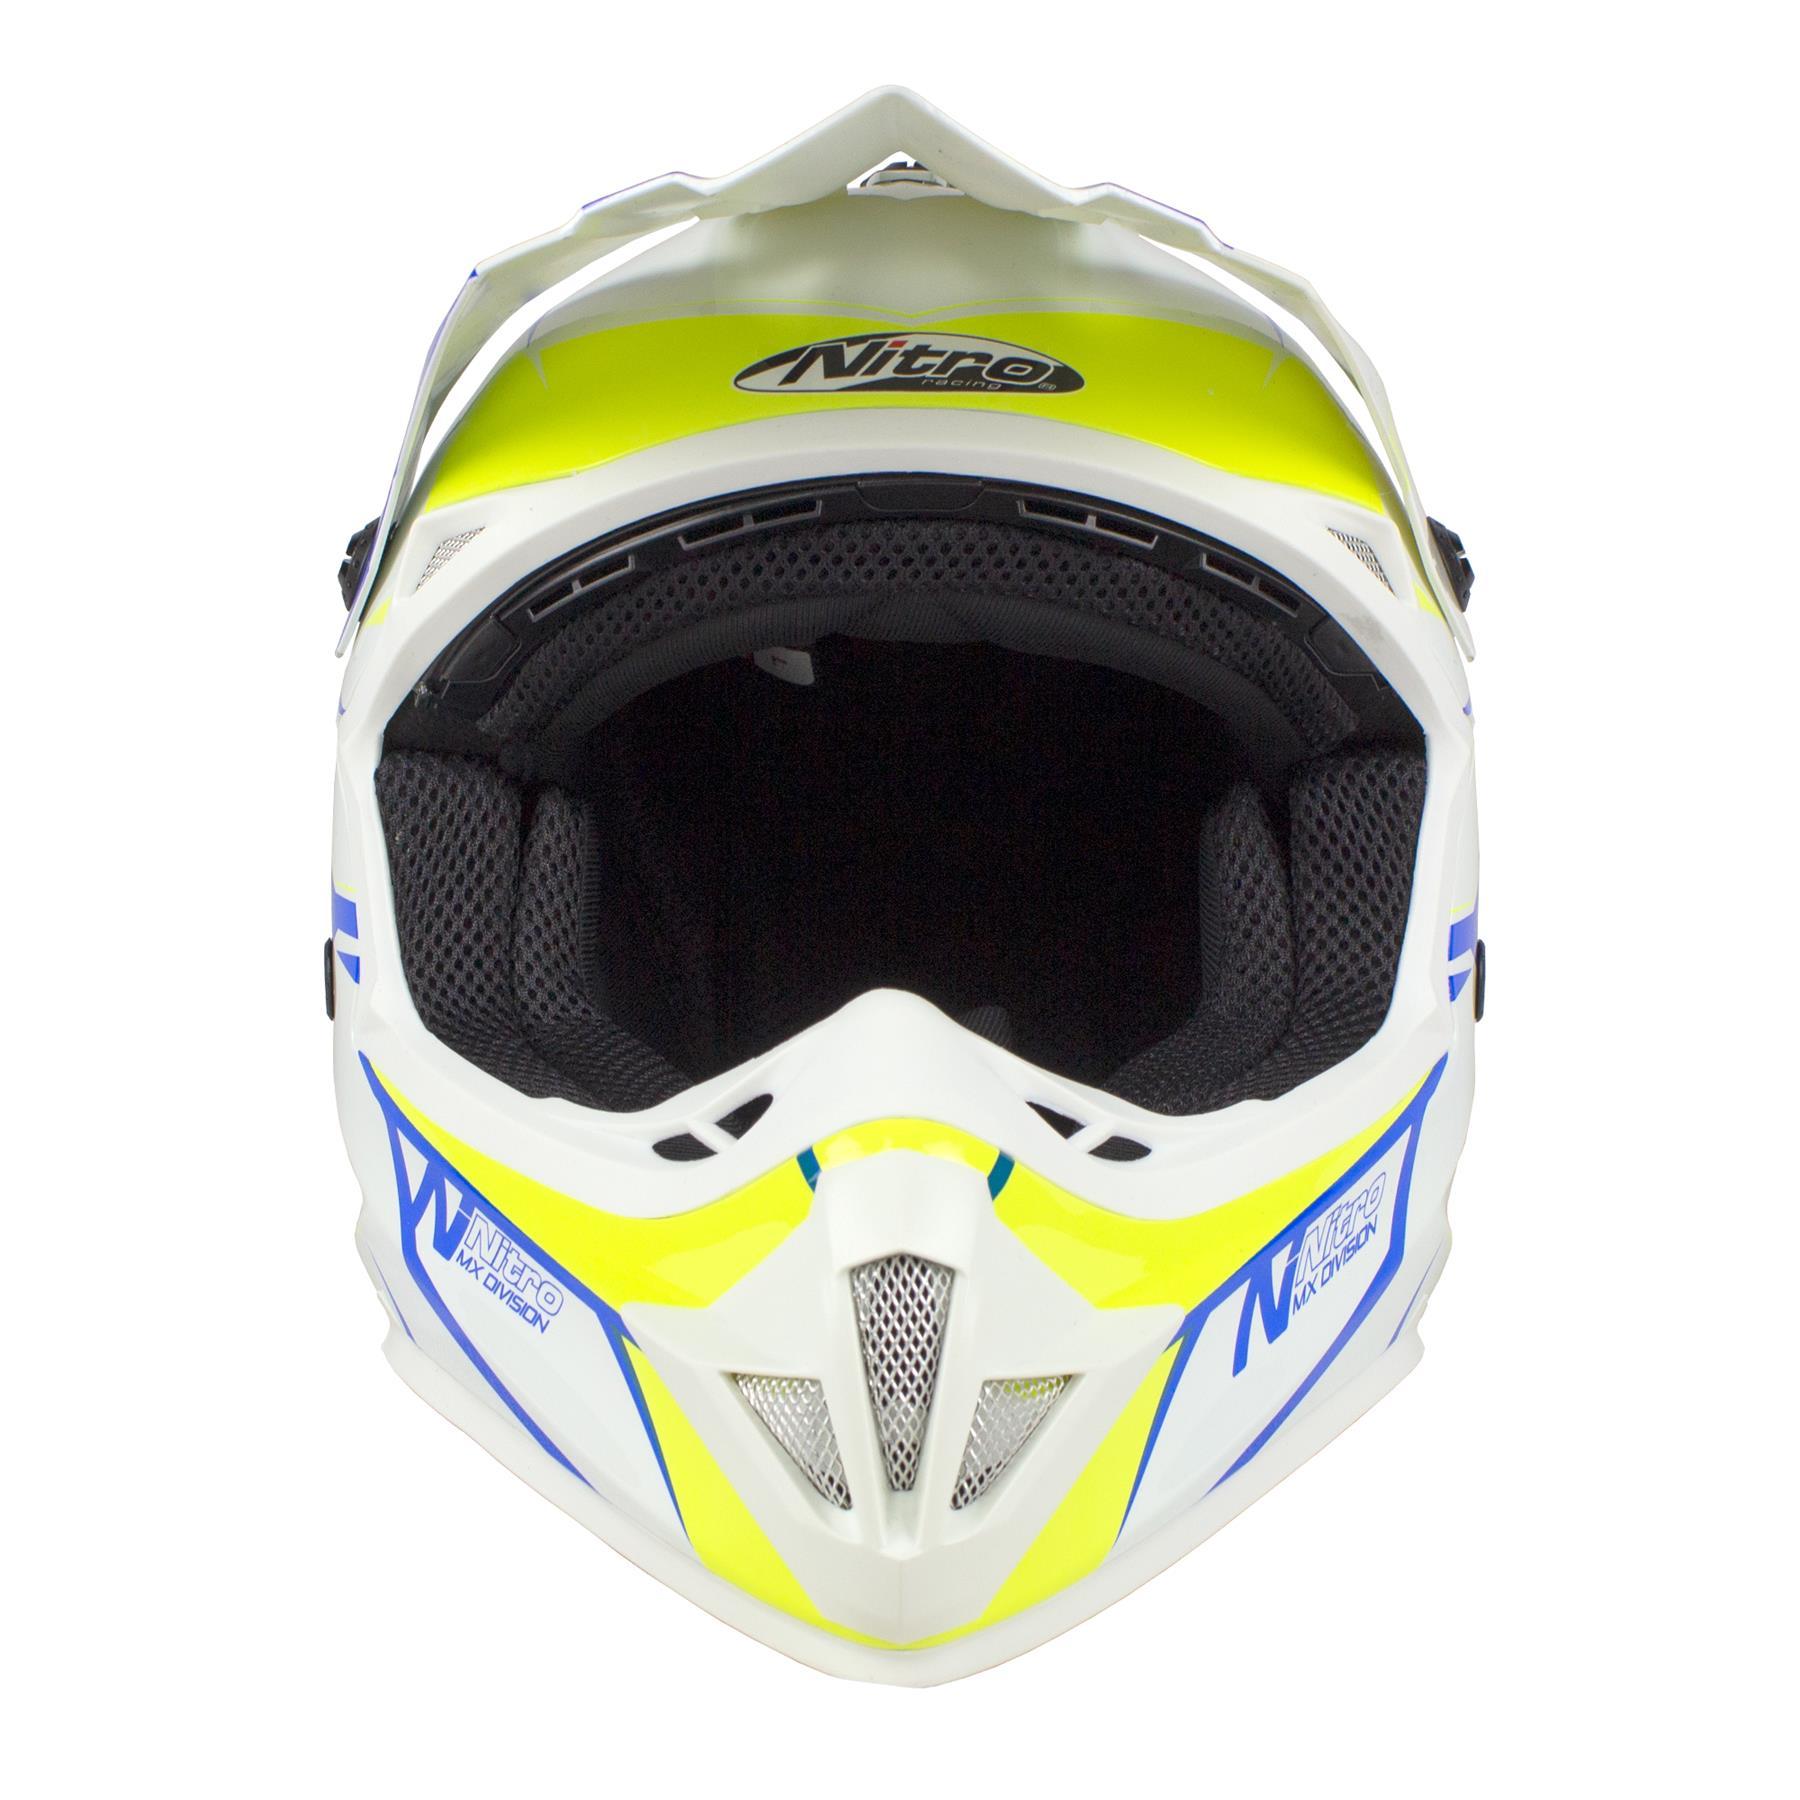 Nitro-MX620-Podium-MX-Motorcross-Motorcycle-Helmet-ATV-Enduro-ACU-Adult-Youth thumbnail 36